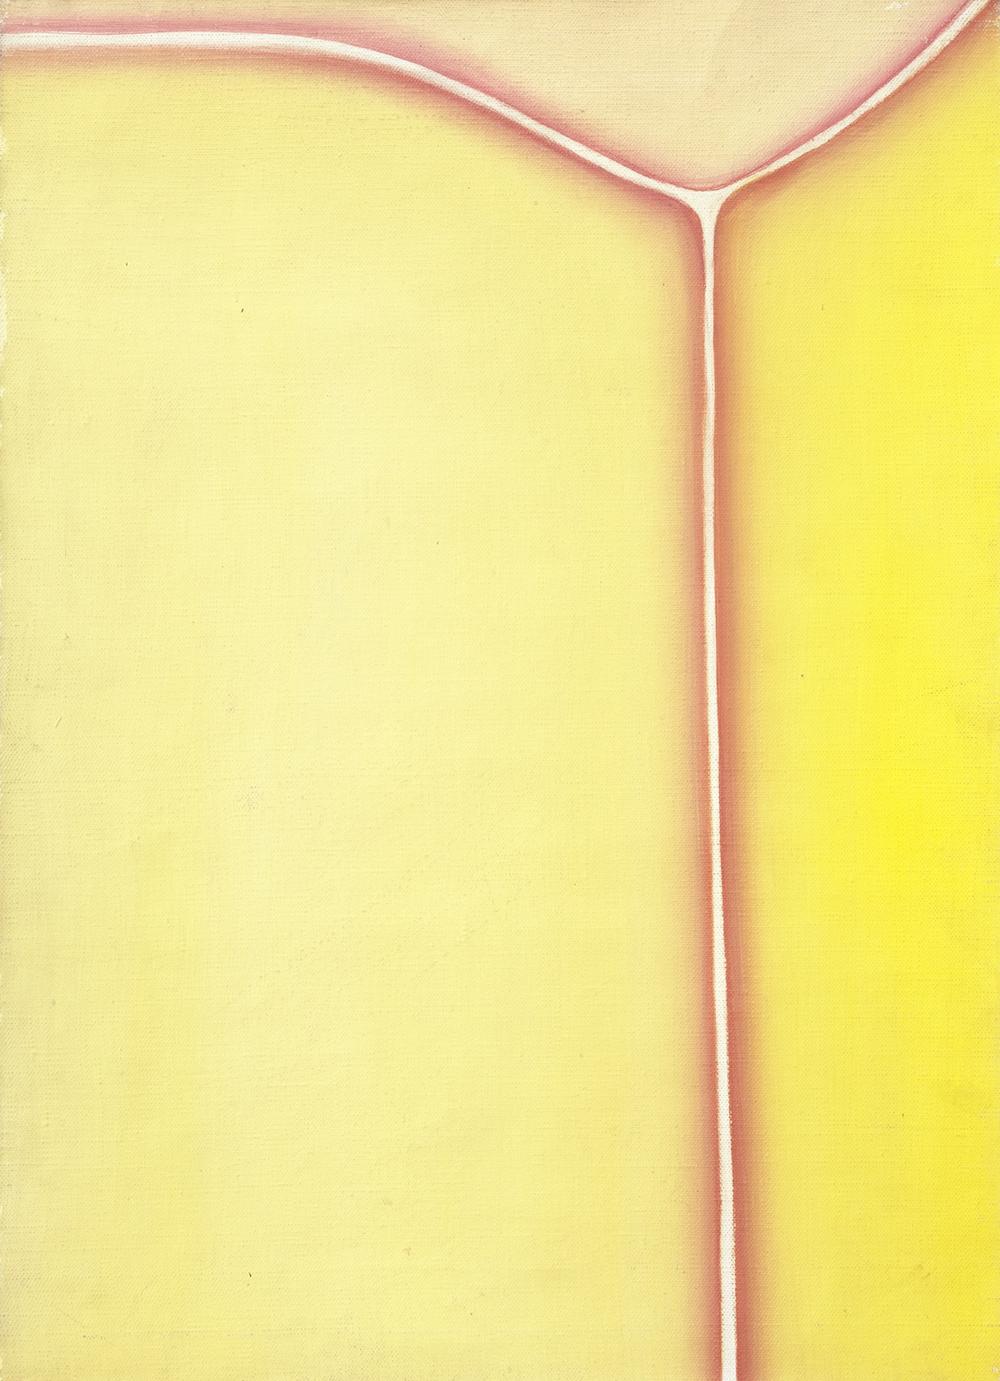 Huguette Caland   Bribes de Corps , 1973 oil on linen 19 x 13.75 inches 48.3 x 34.9 cm